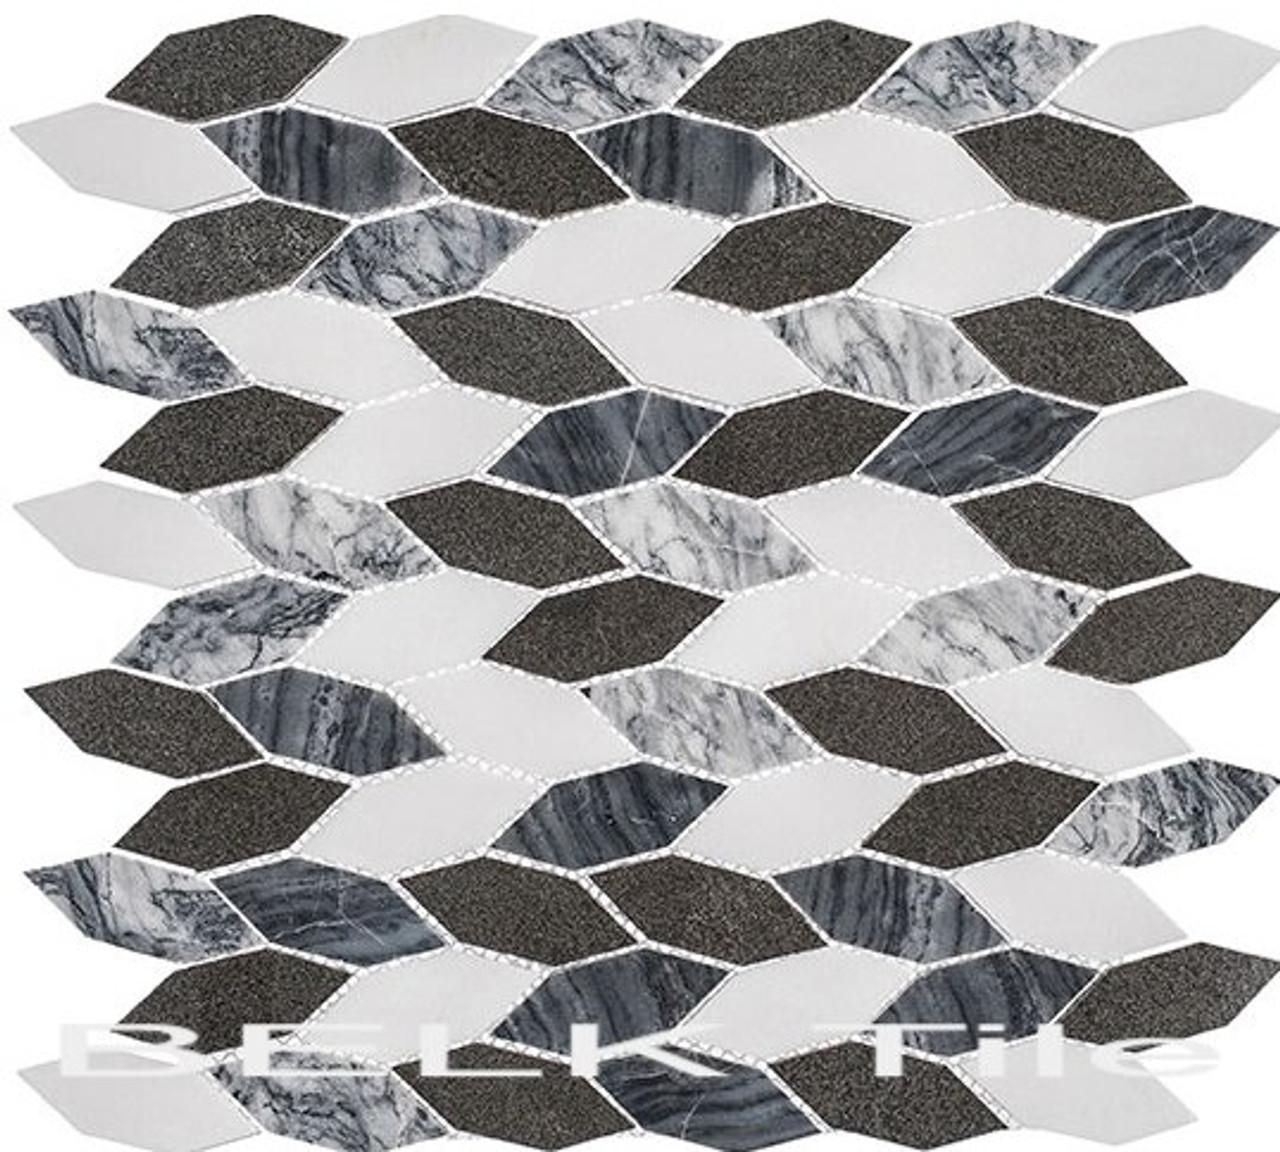 Bella Glass Tiles Colonial Series Long Hex Presidential Grey CLNL-280